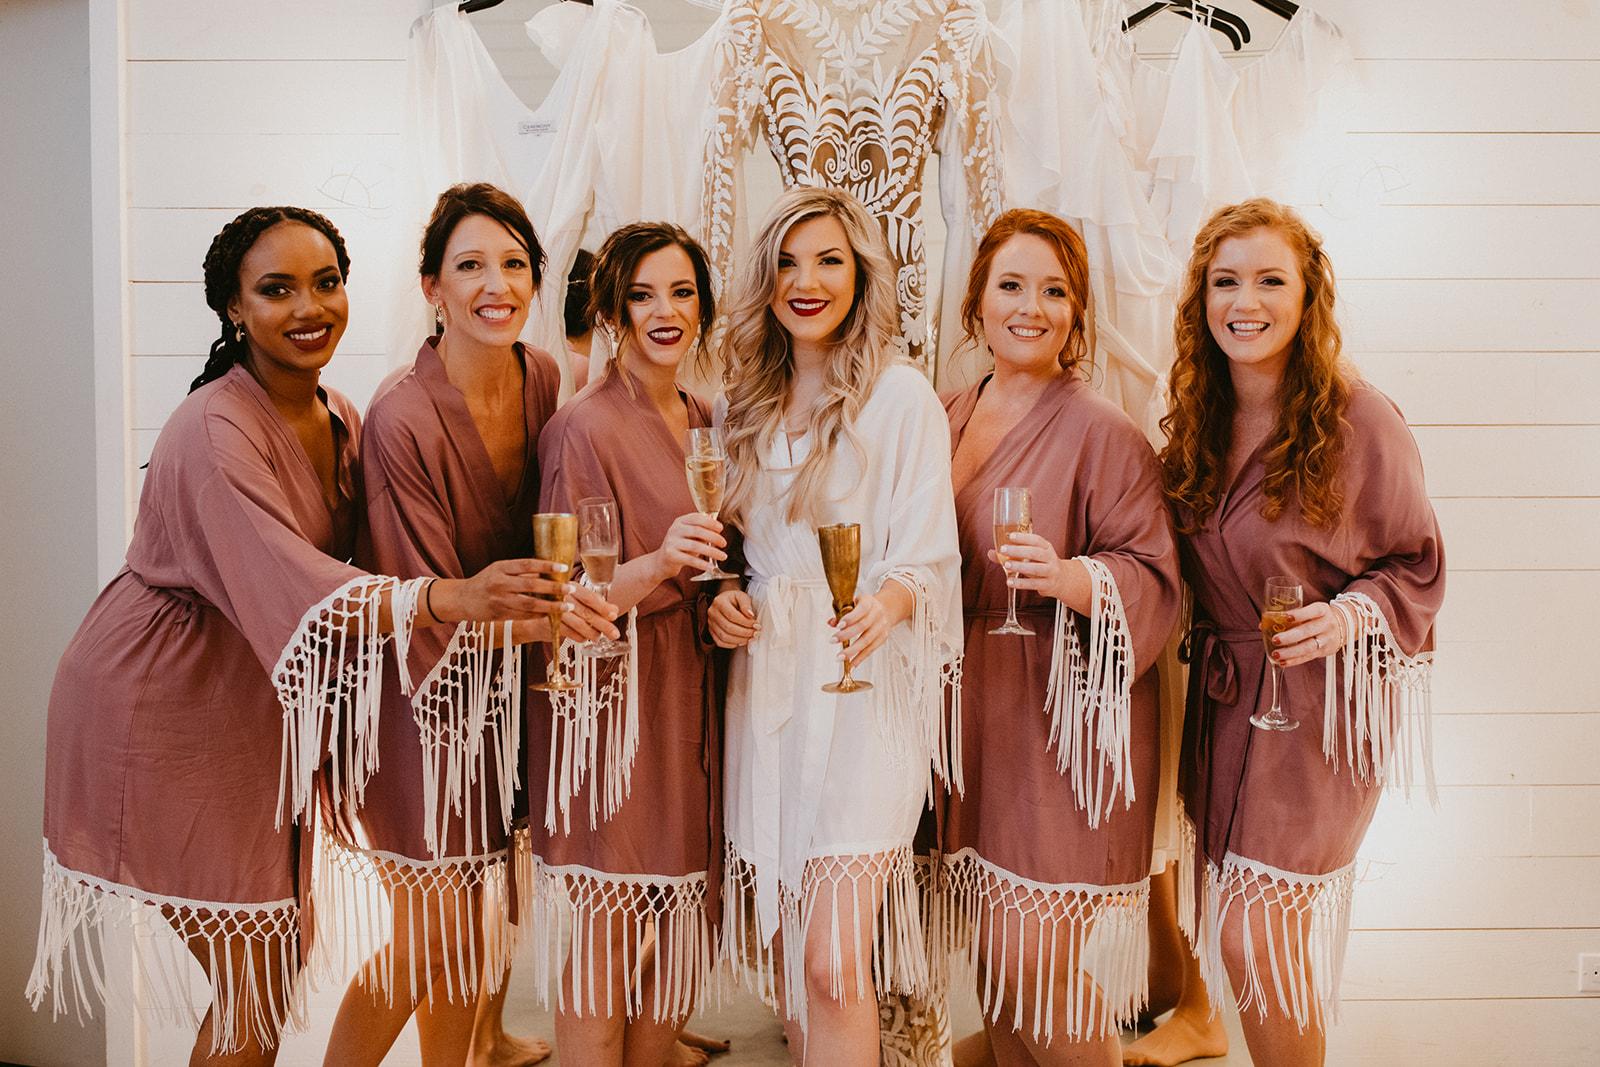 Boho Fringe Bridesmaid Getting Ready Robe Outfits + Destination Wedding Planner Epoch Co+ + Colorado Photographer Century Tree